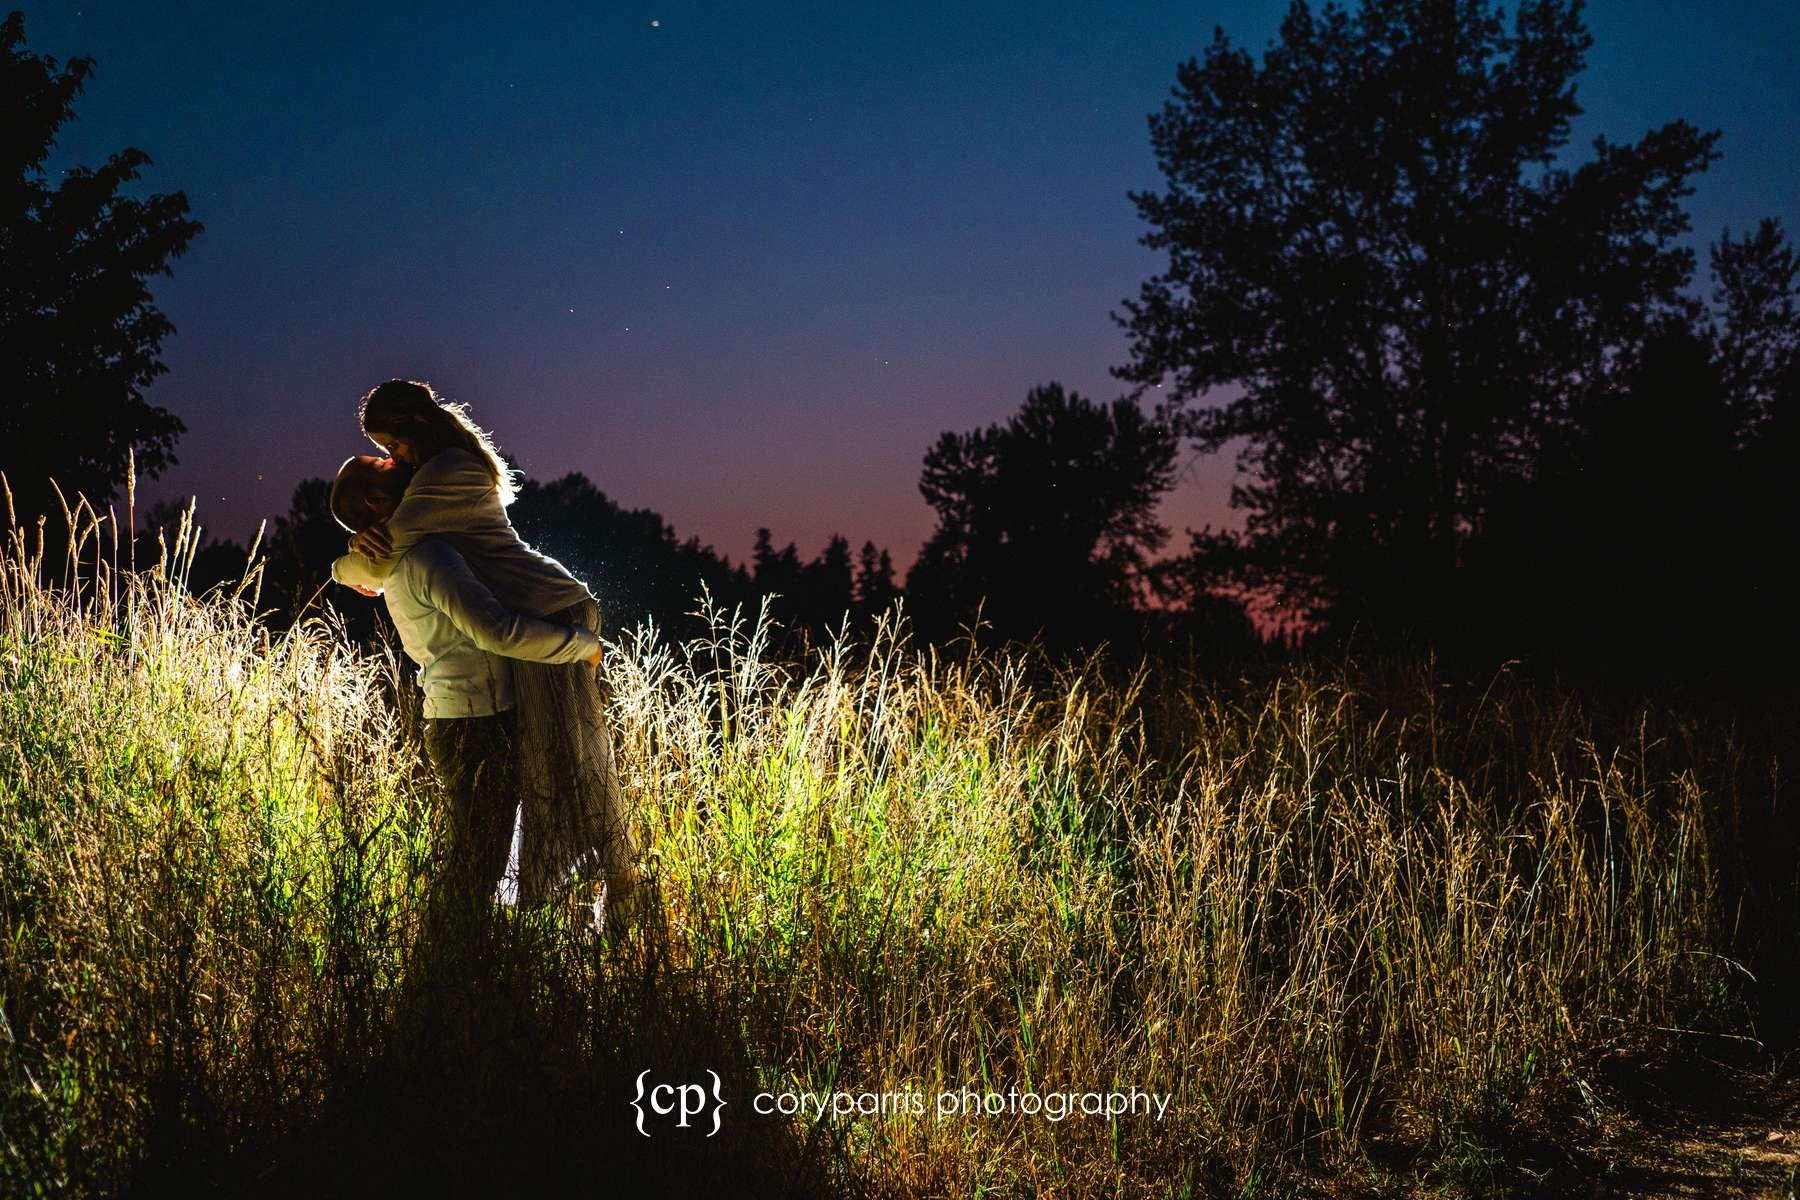 113-Engagement-Portraits-Marrymoor-Park.jpg